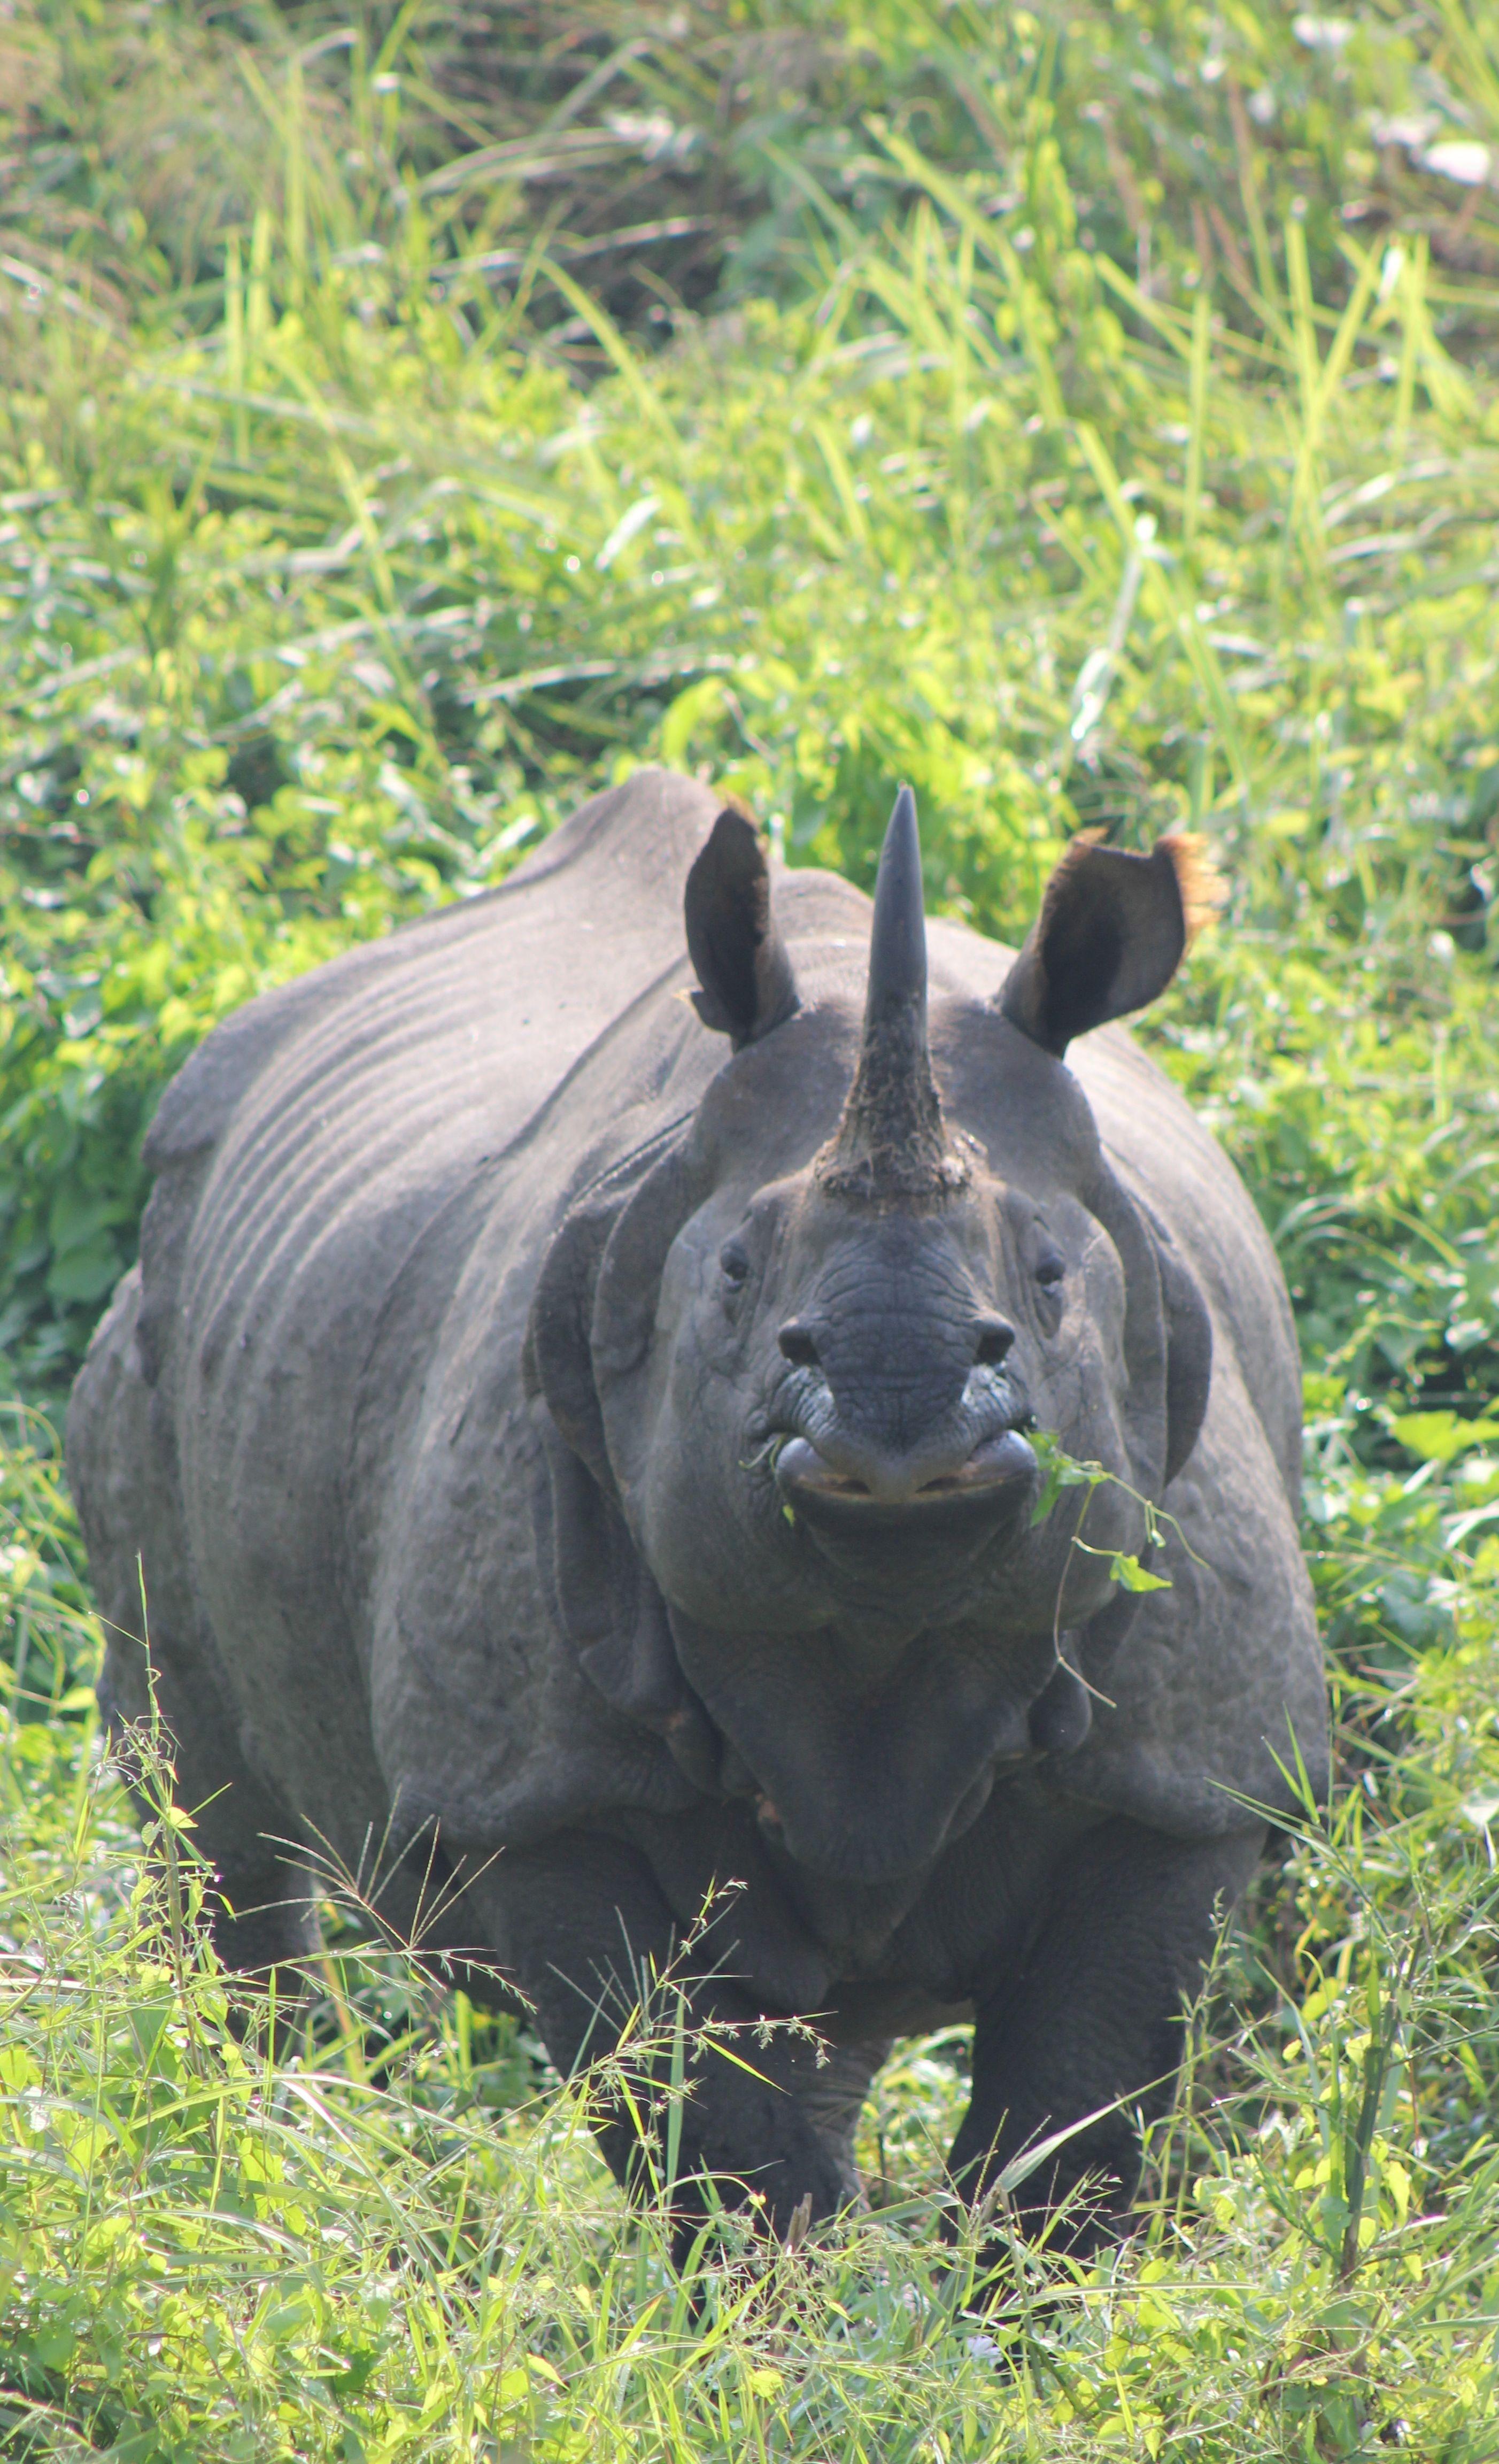 The Gap Year Blog Volunteer Journals Volunteer Photo Blog Rebecca Walters Travel Journal From Nepal Animals Big Animals Wildlife Animals